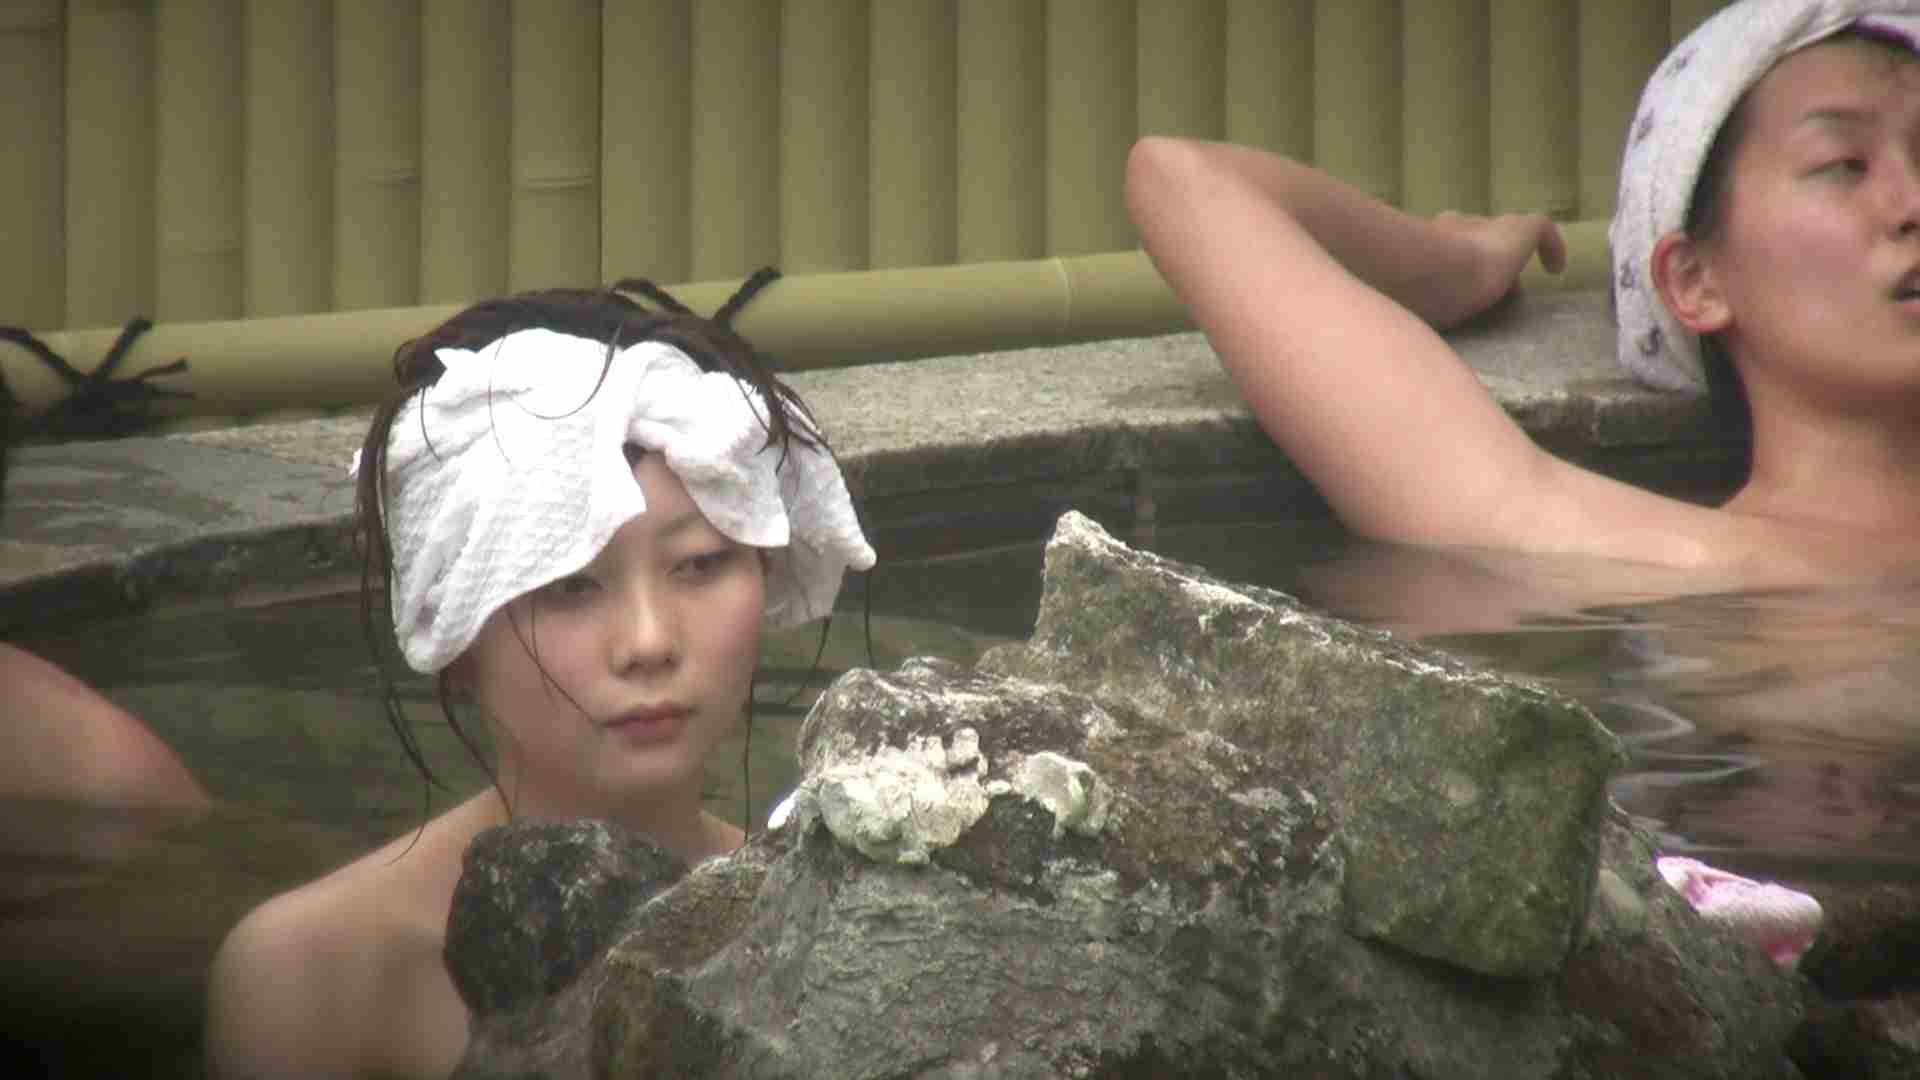 Aquaな露天風呂Vol.147 綺麗なOLたち アダルト動画キャプチャ 102枚 2